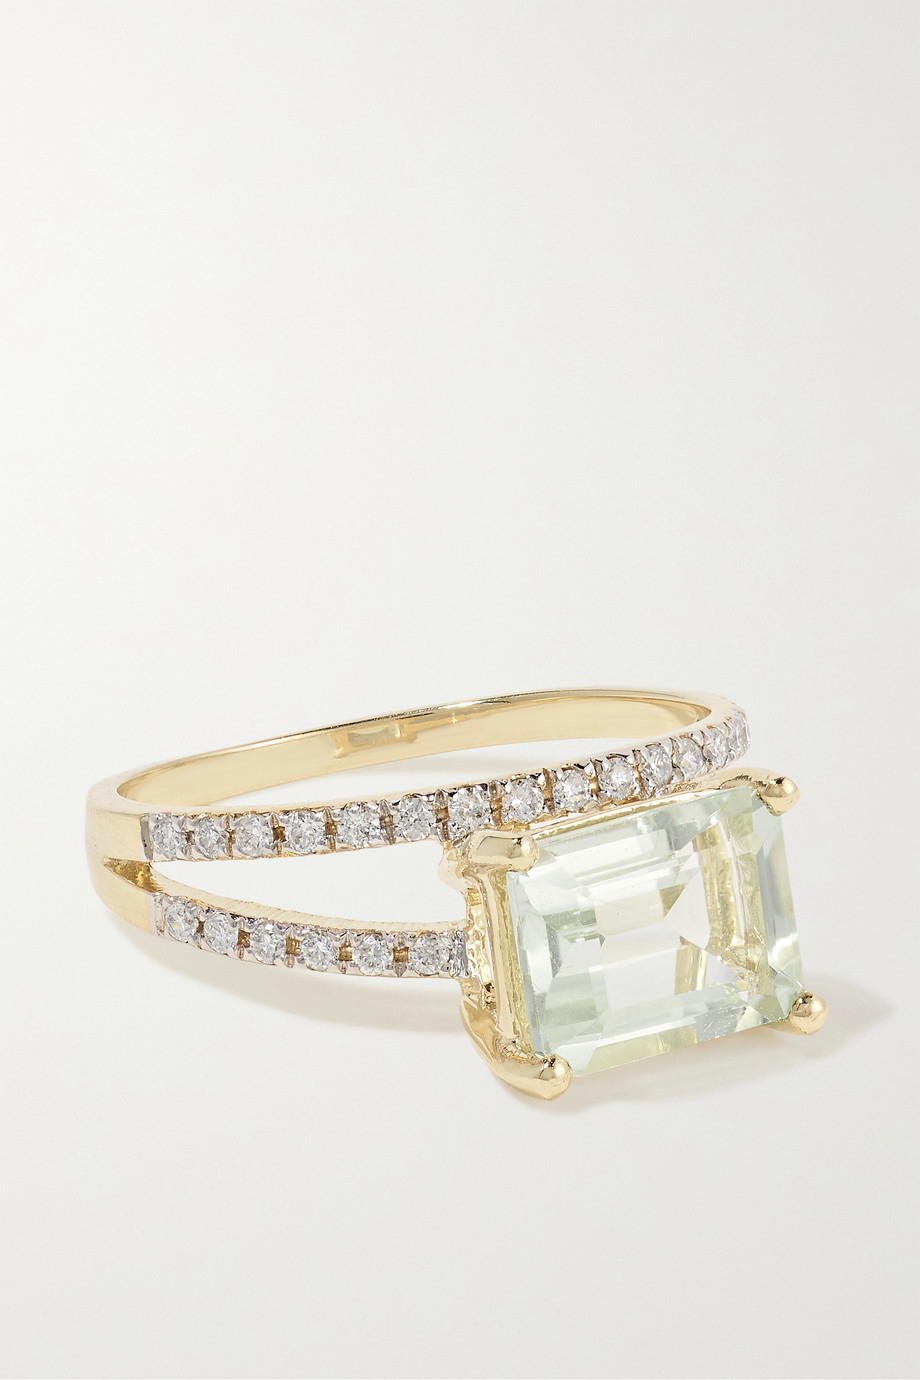 Mateo 14K 黄金、紫水晶、钻石戒指